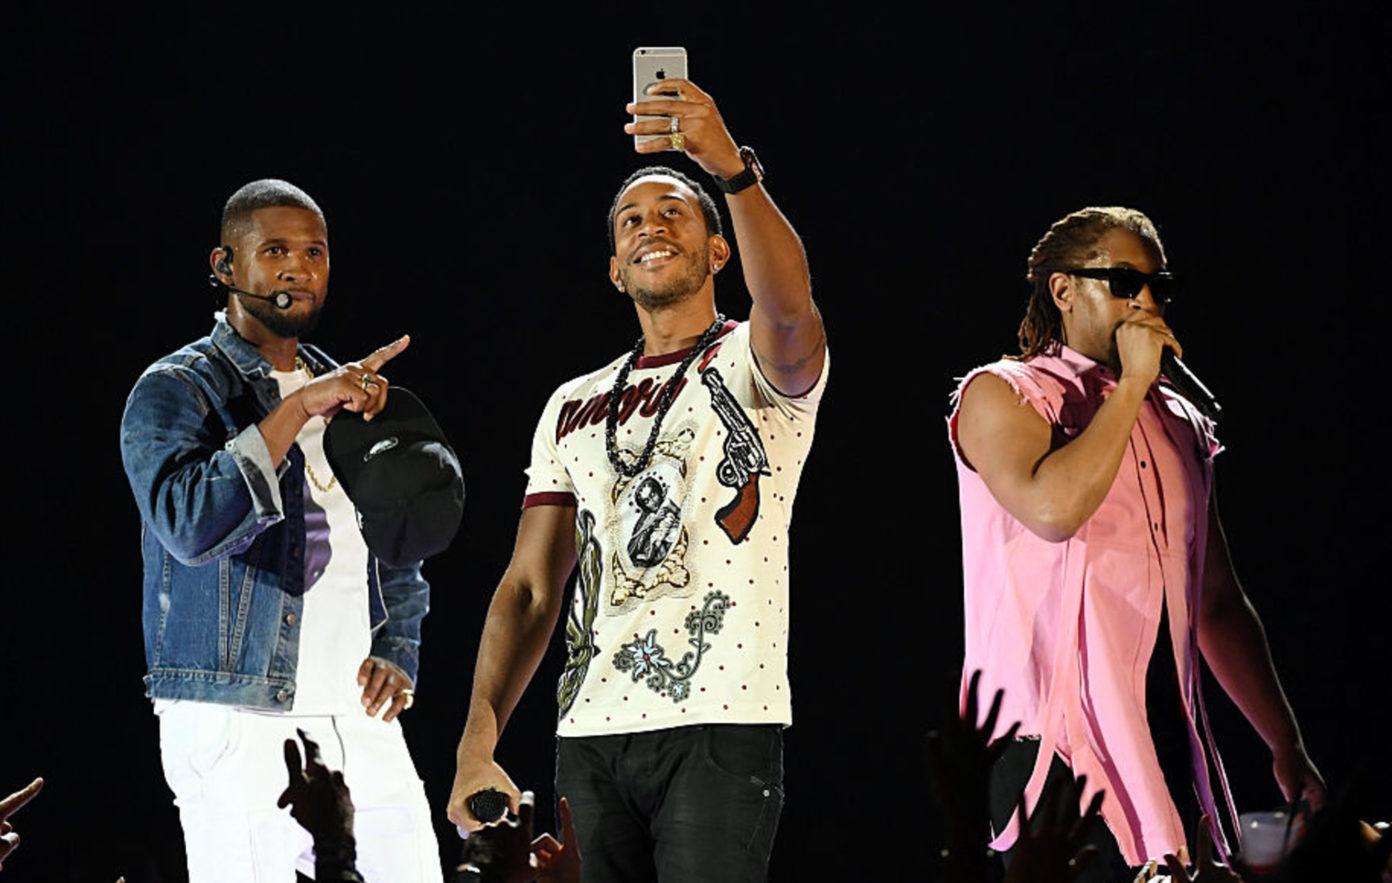 Usher, Lil Jon & Ludacris